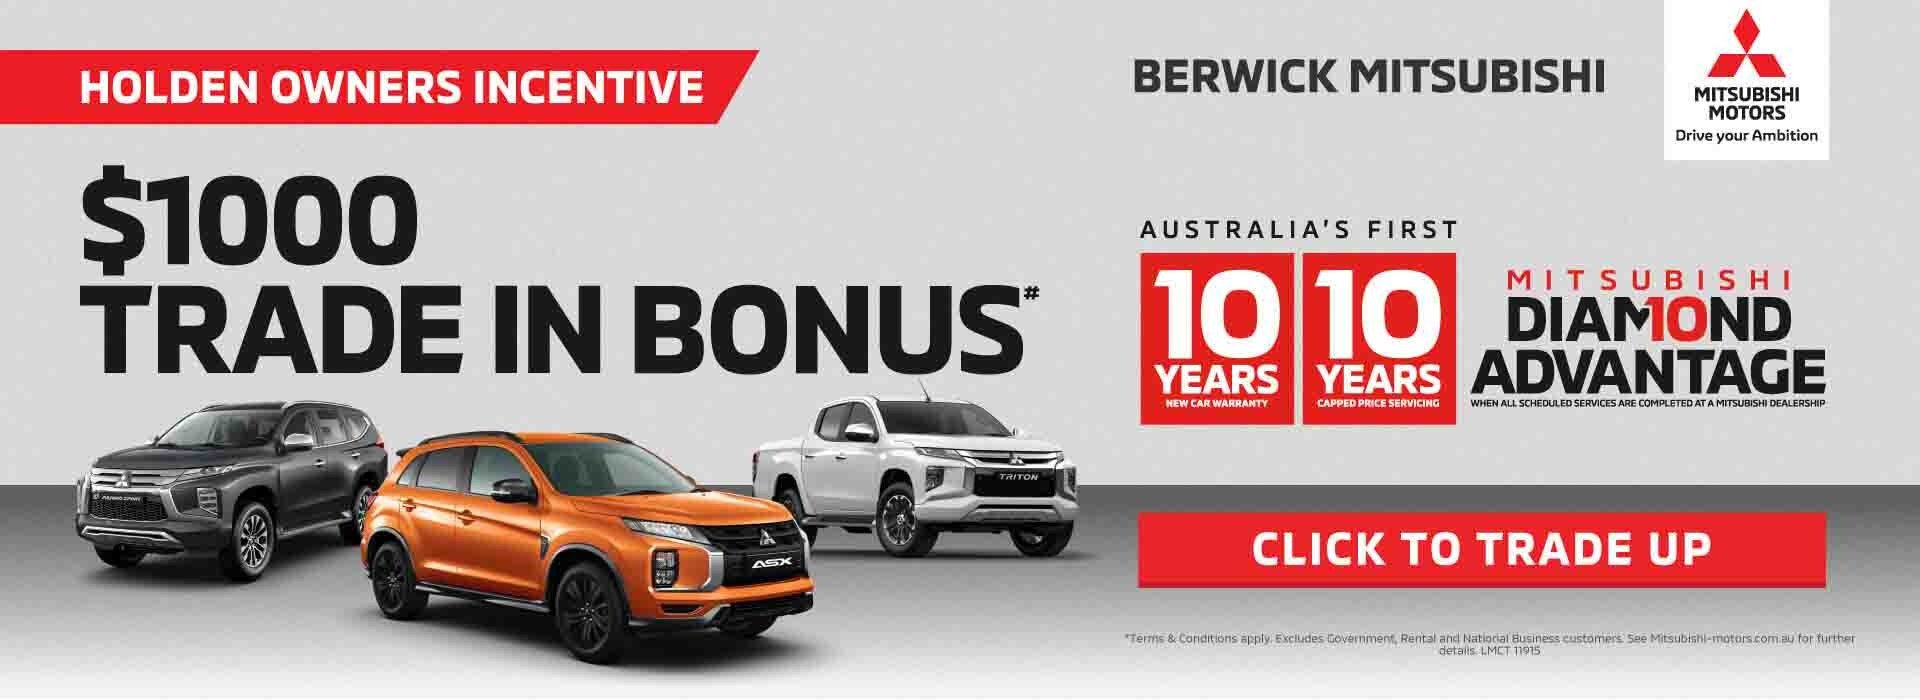 Berwick Mitsubishi Trade-in Offer